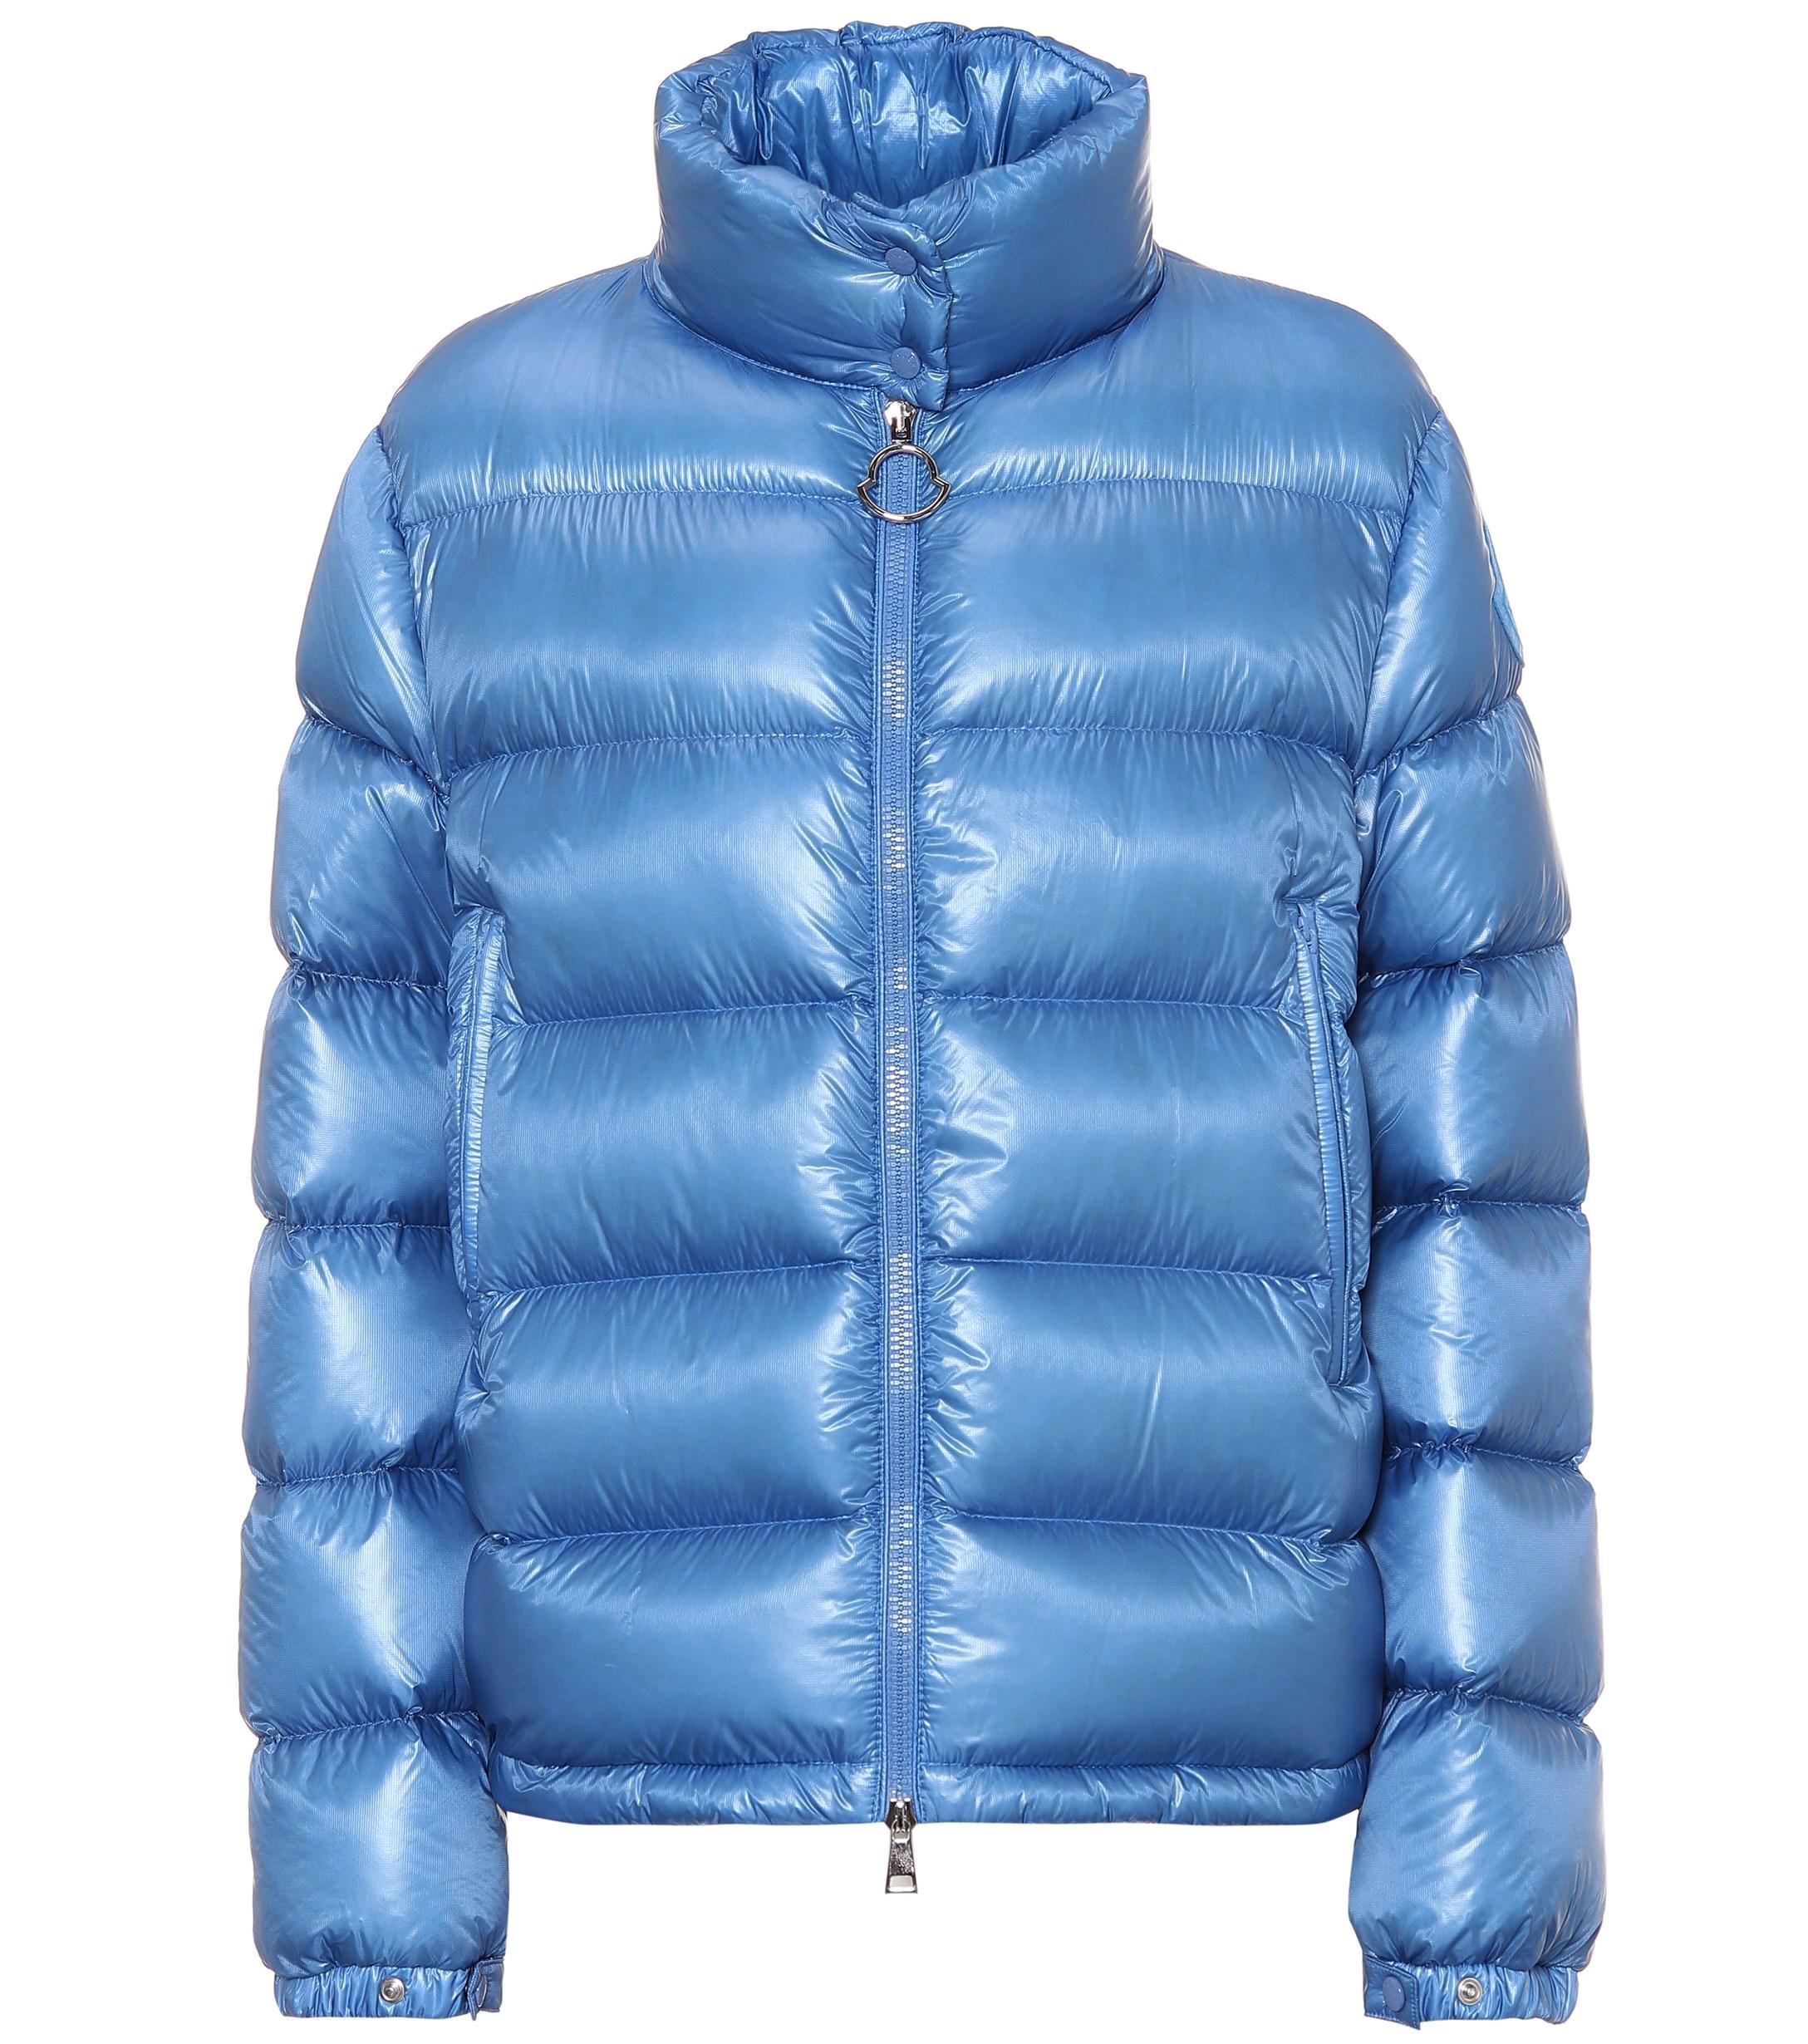 727537c07 Women's Blue Copenhague High Neck Down Filled Coat